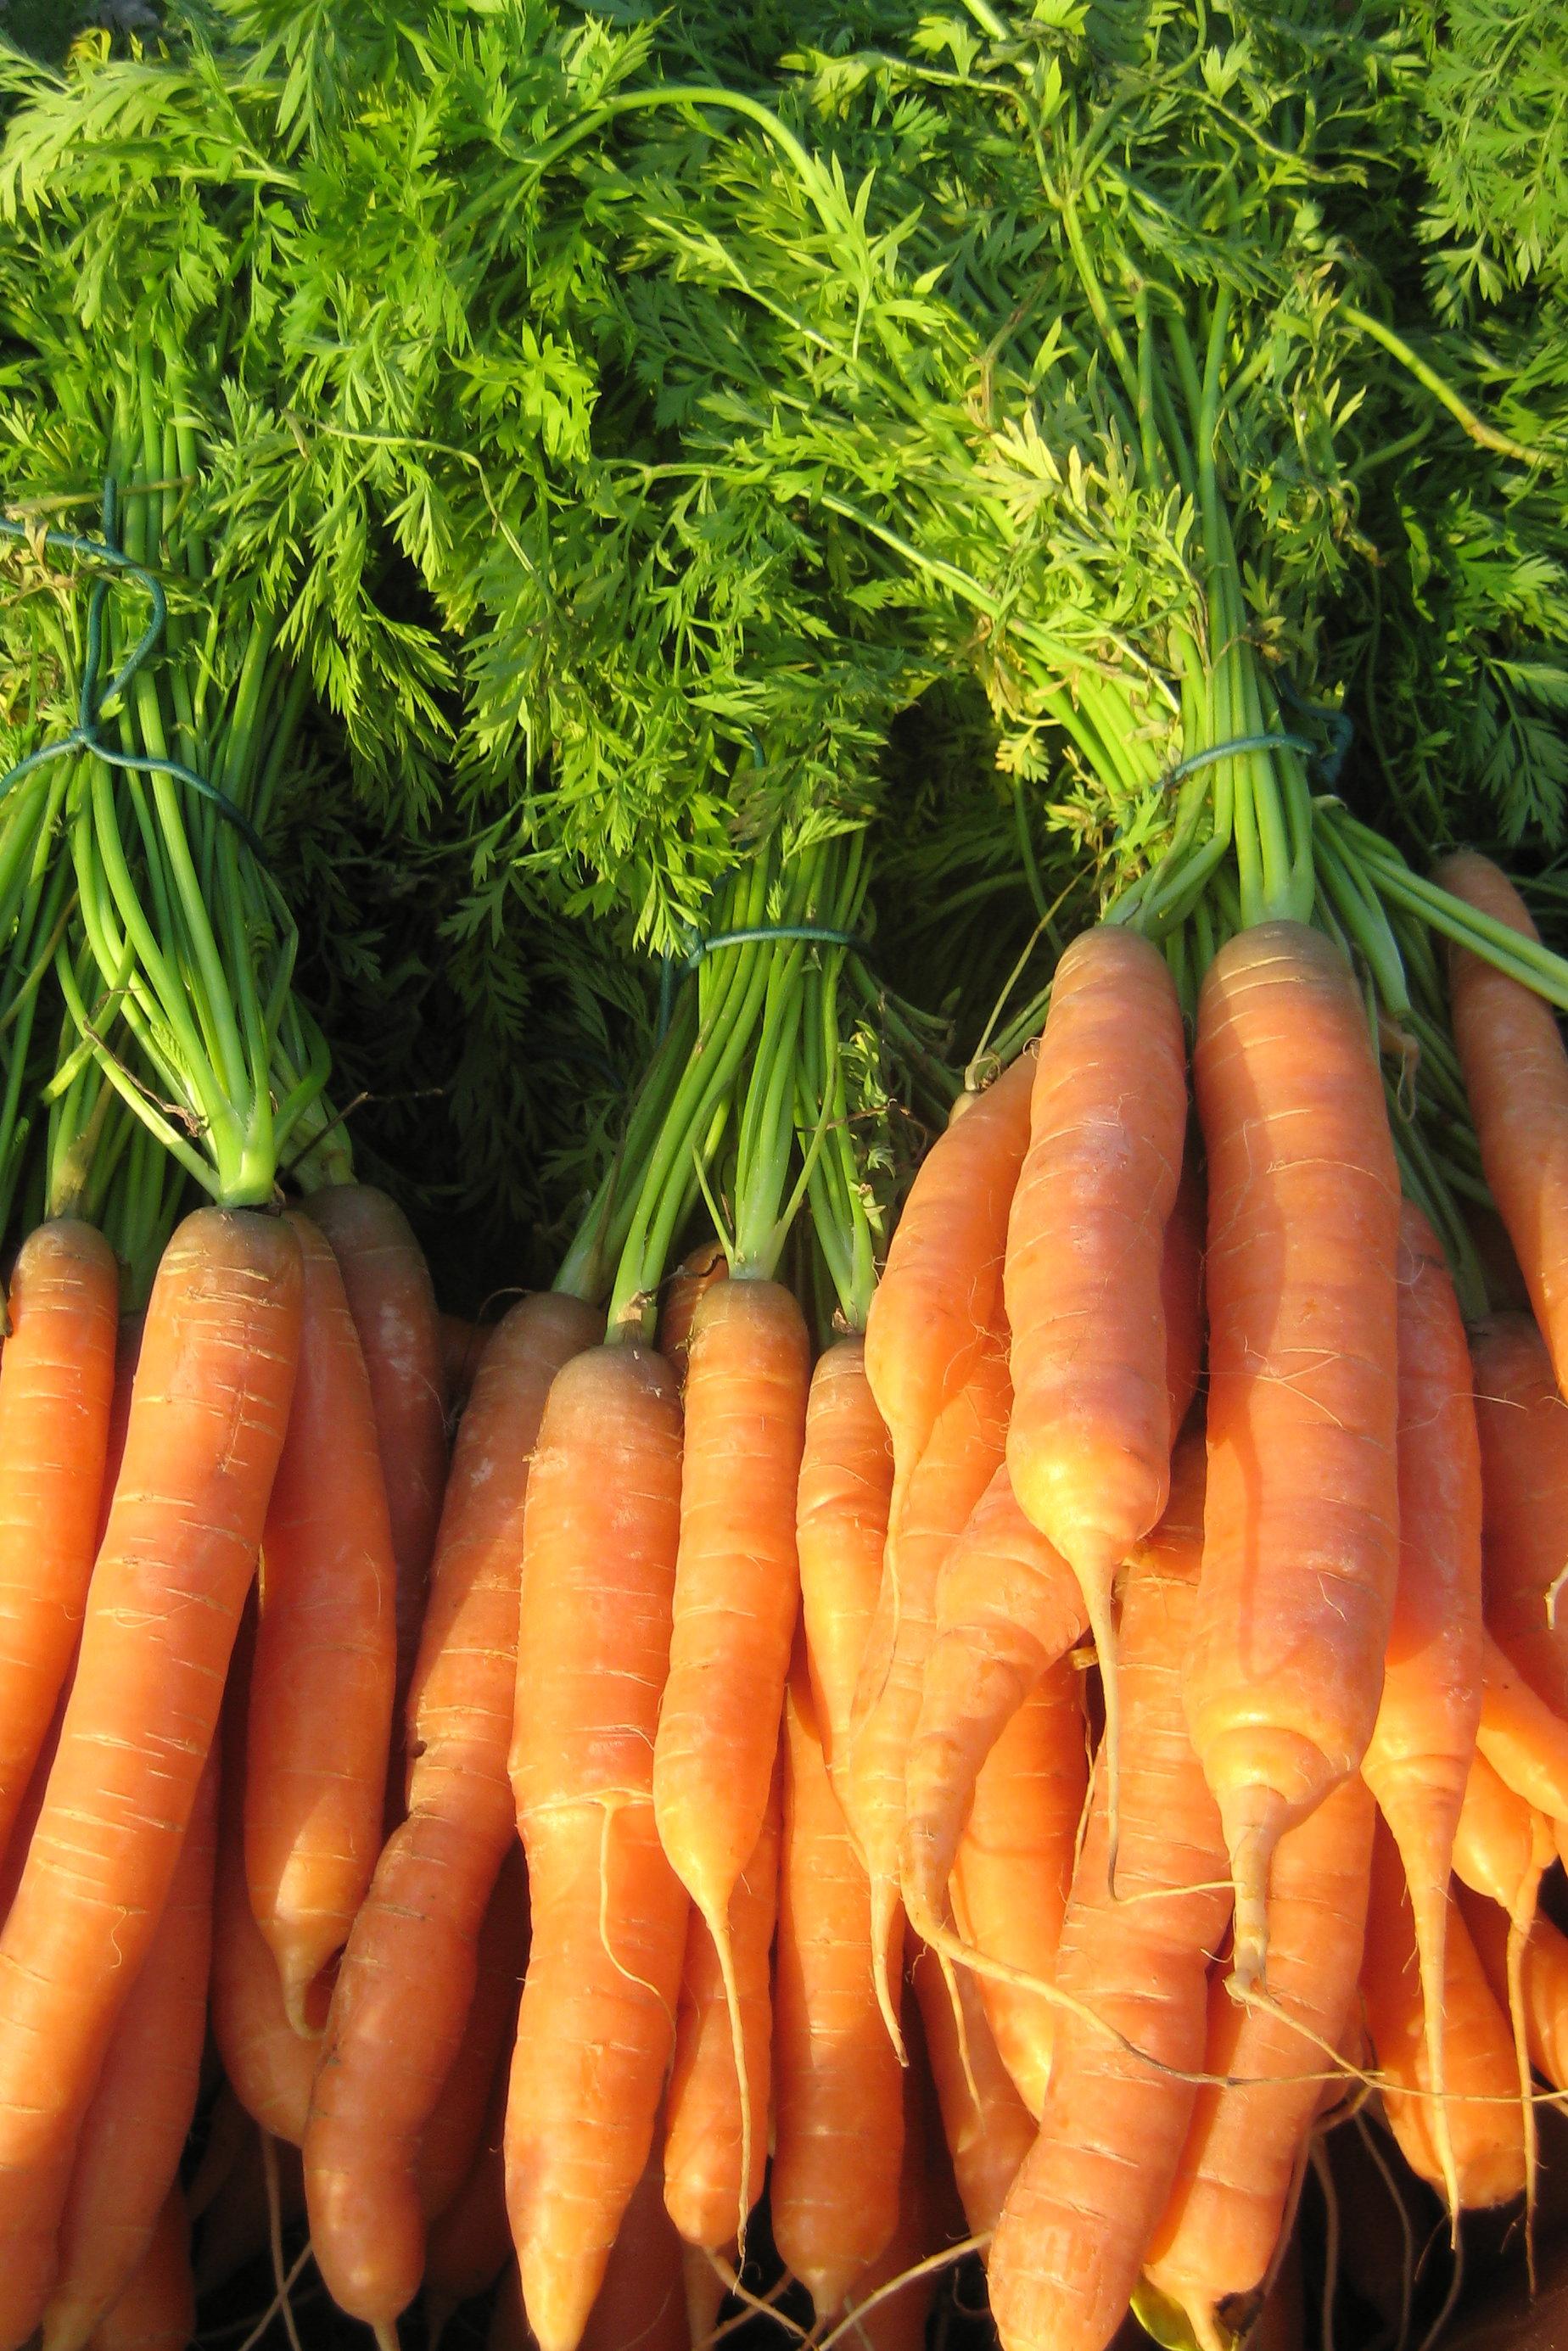 M hre karotte wurzeln gesundes gem se - Karotten kochen ...